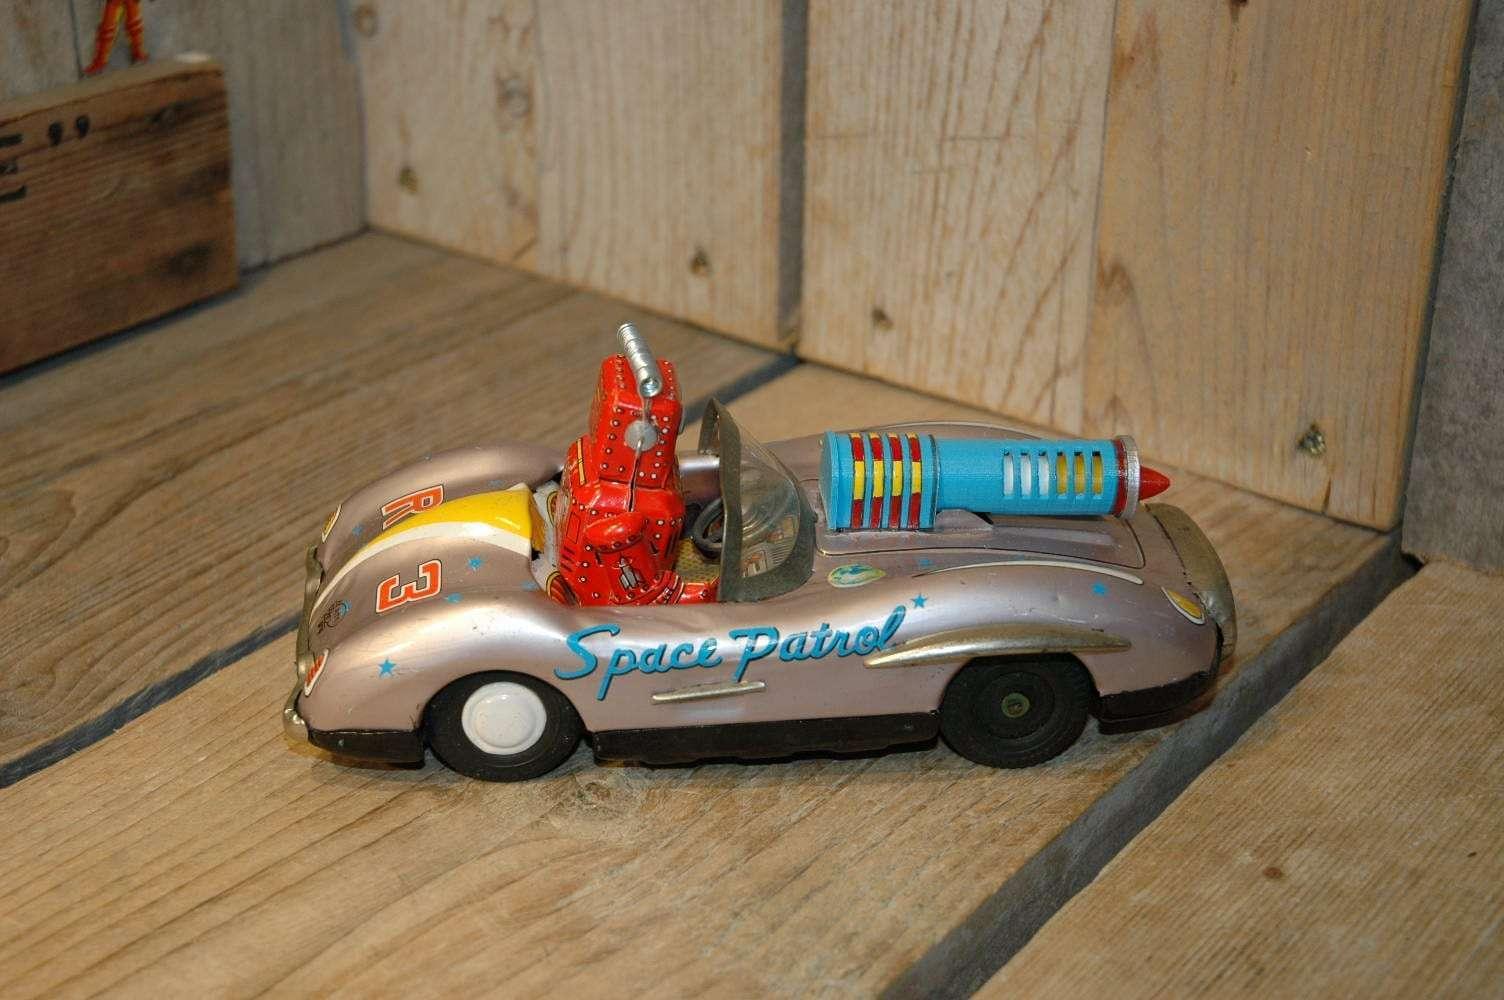 ATC - Space Patrol Car R-3